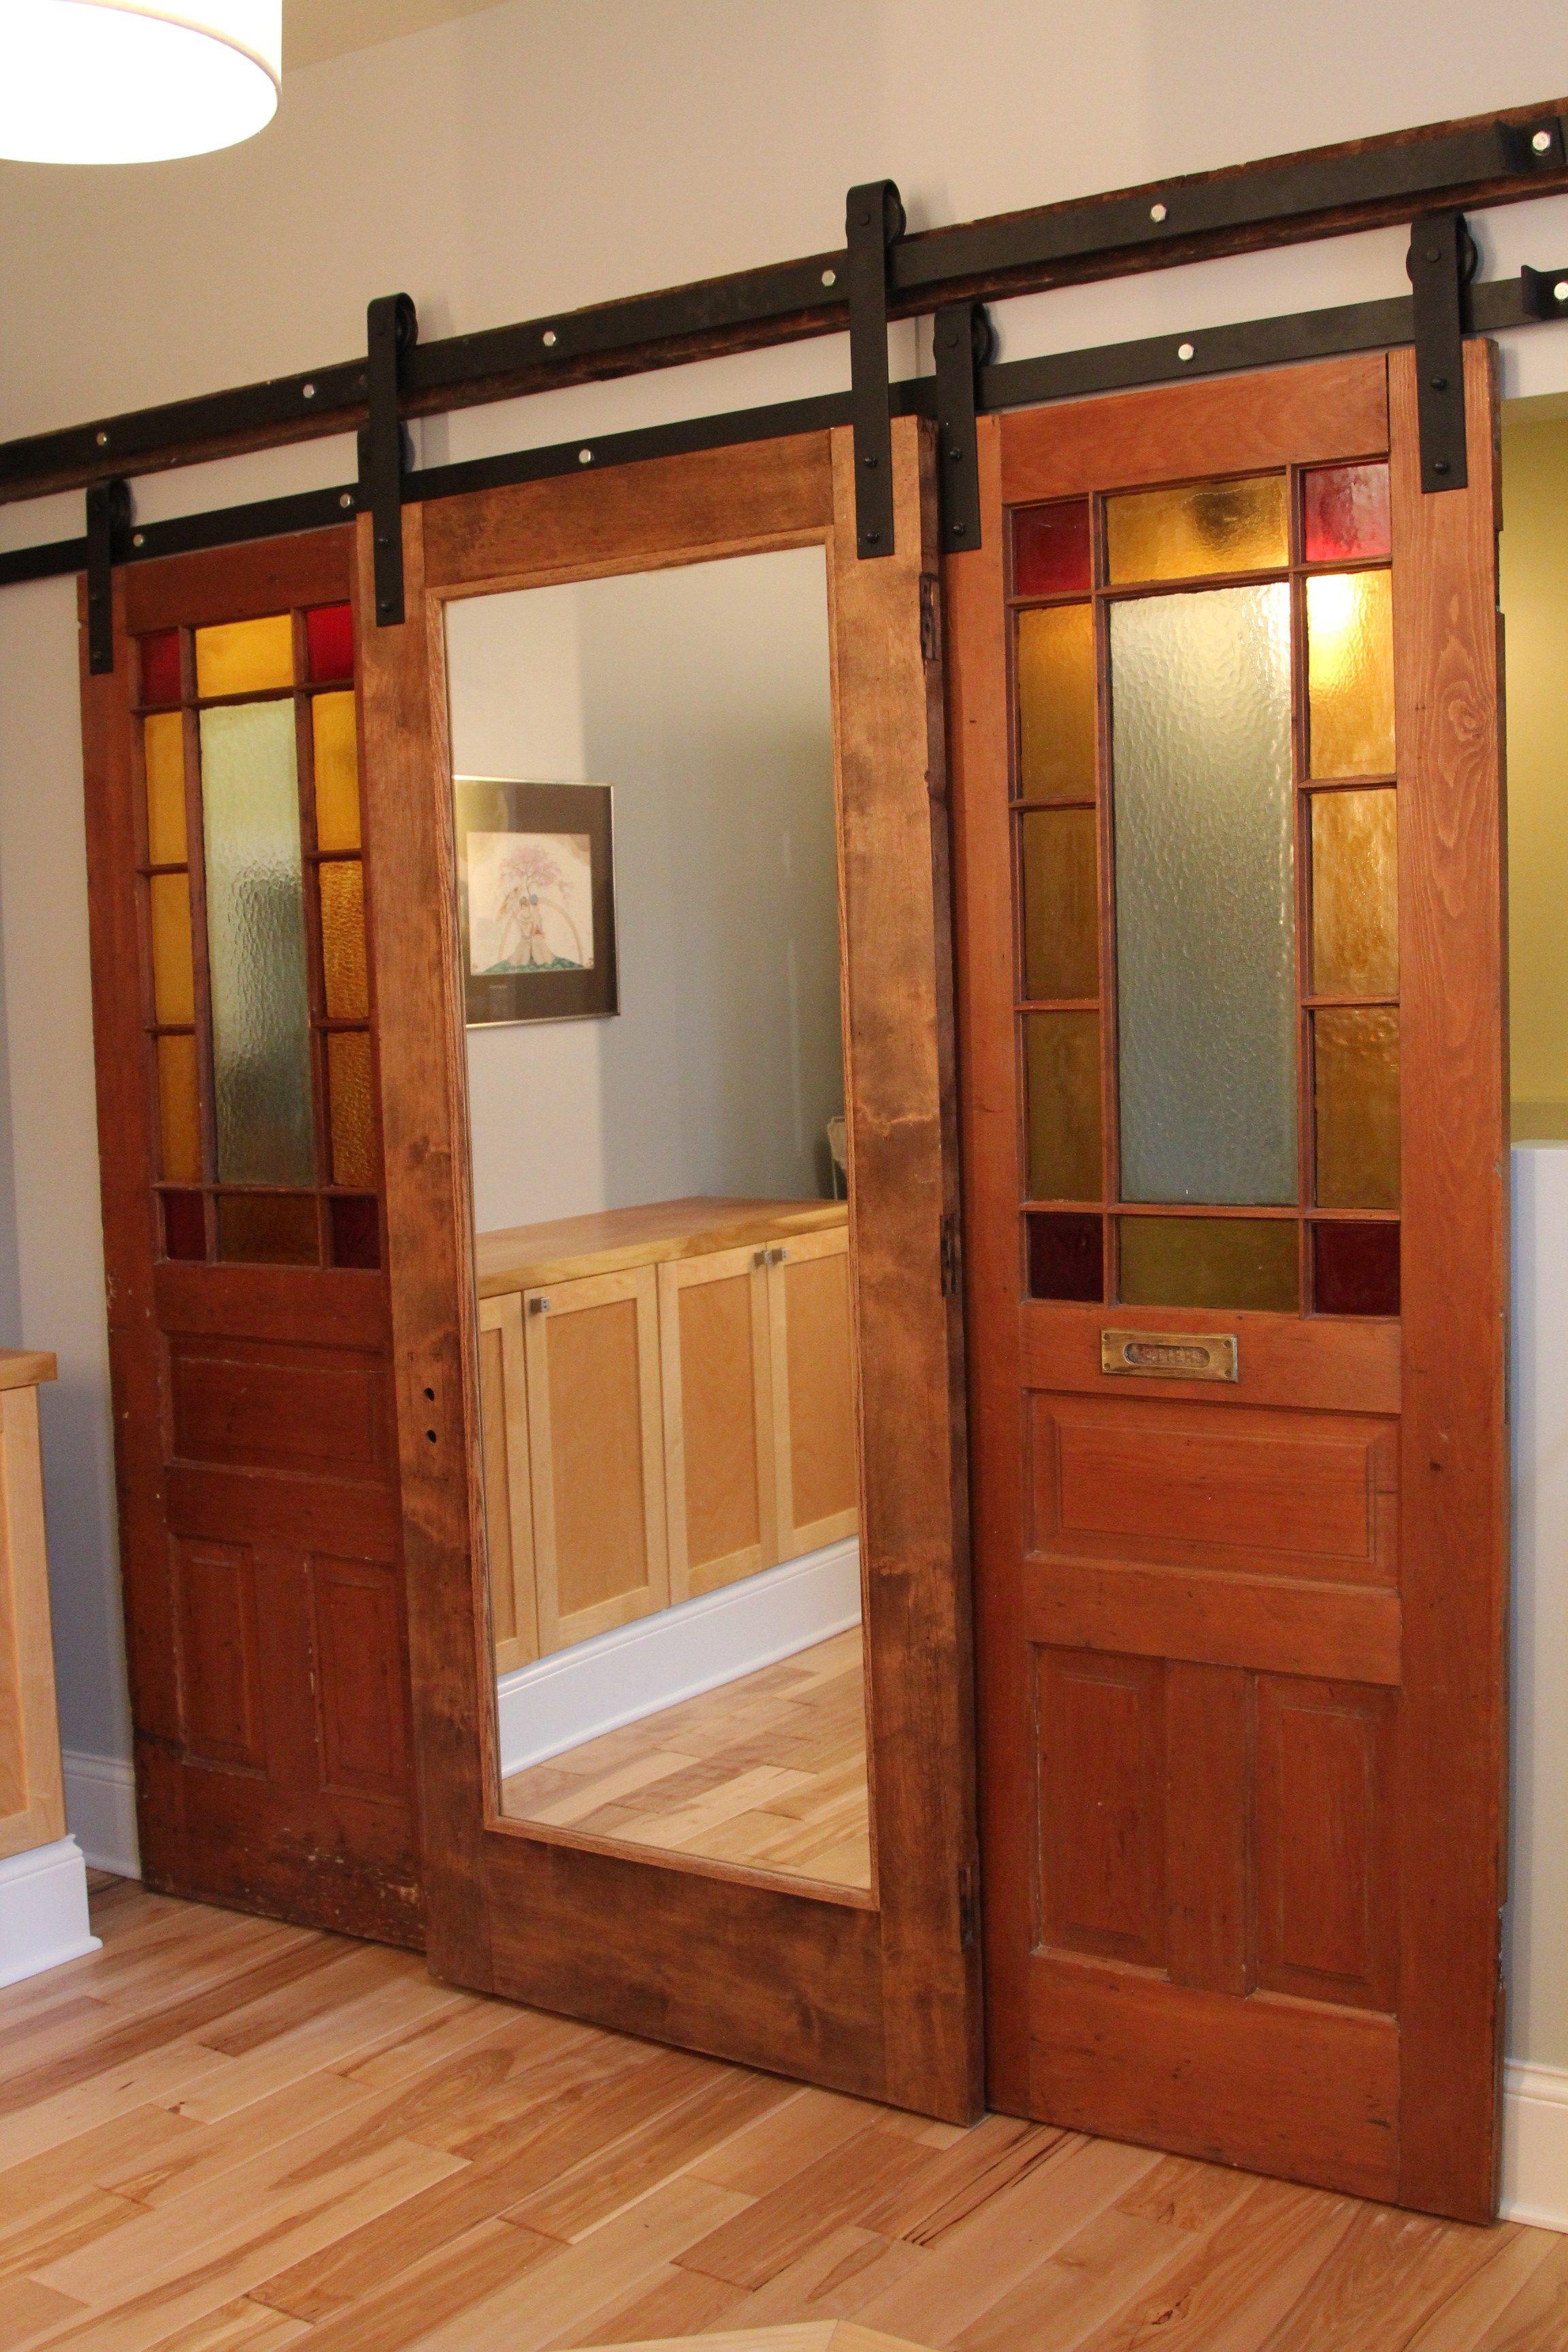 Pin by kyle bruce on barn doors pinterest barn doors doors and barn